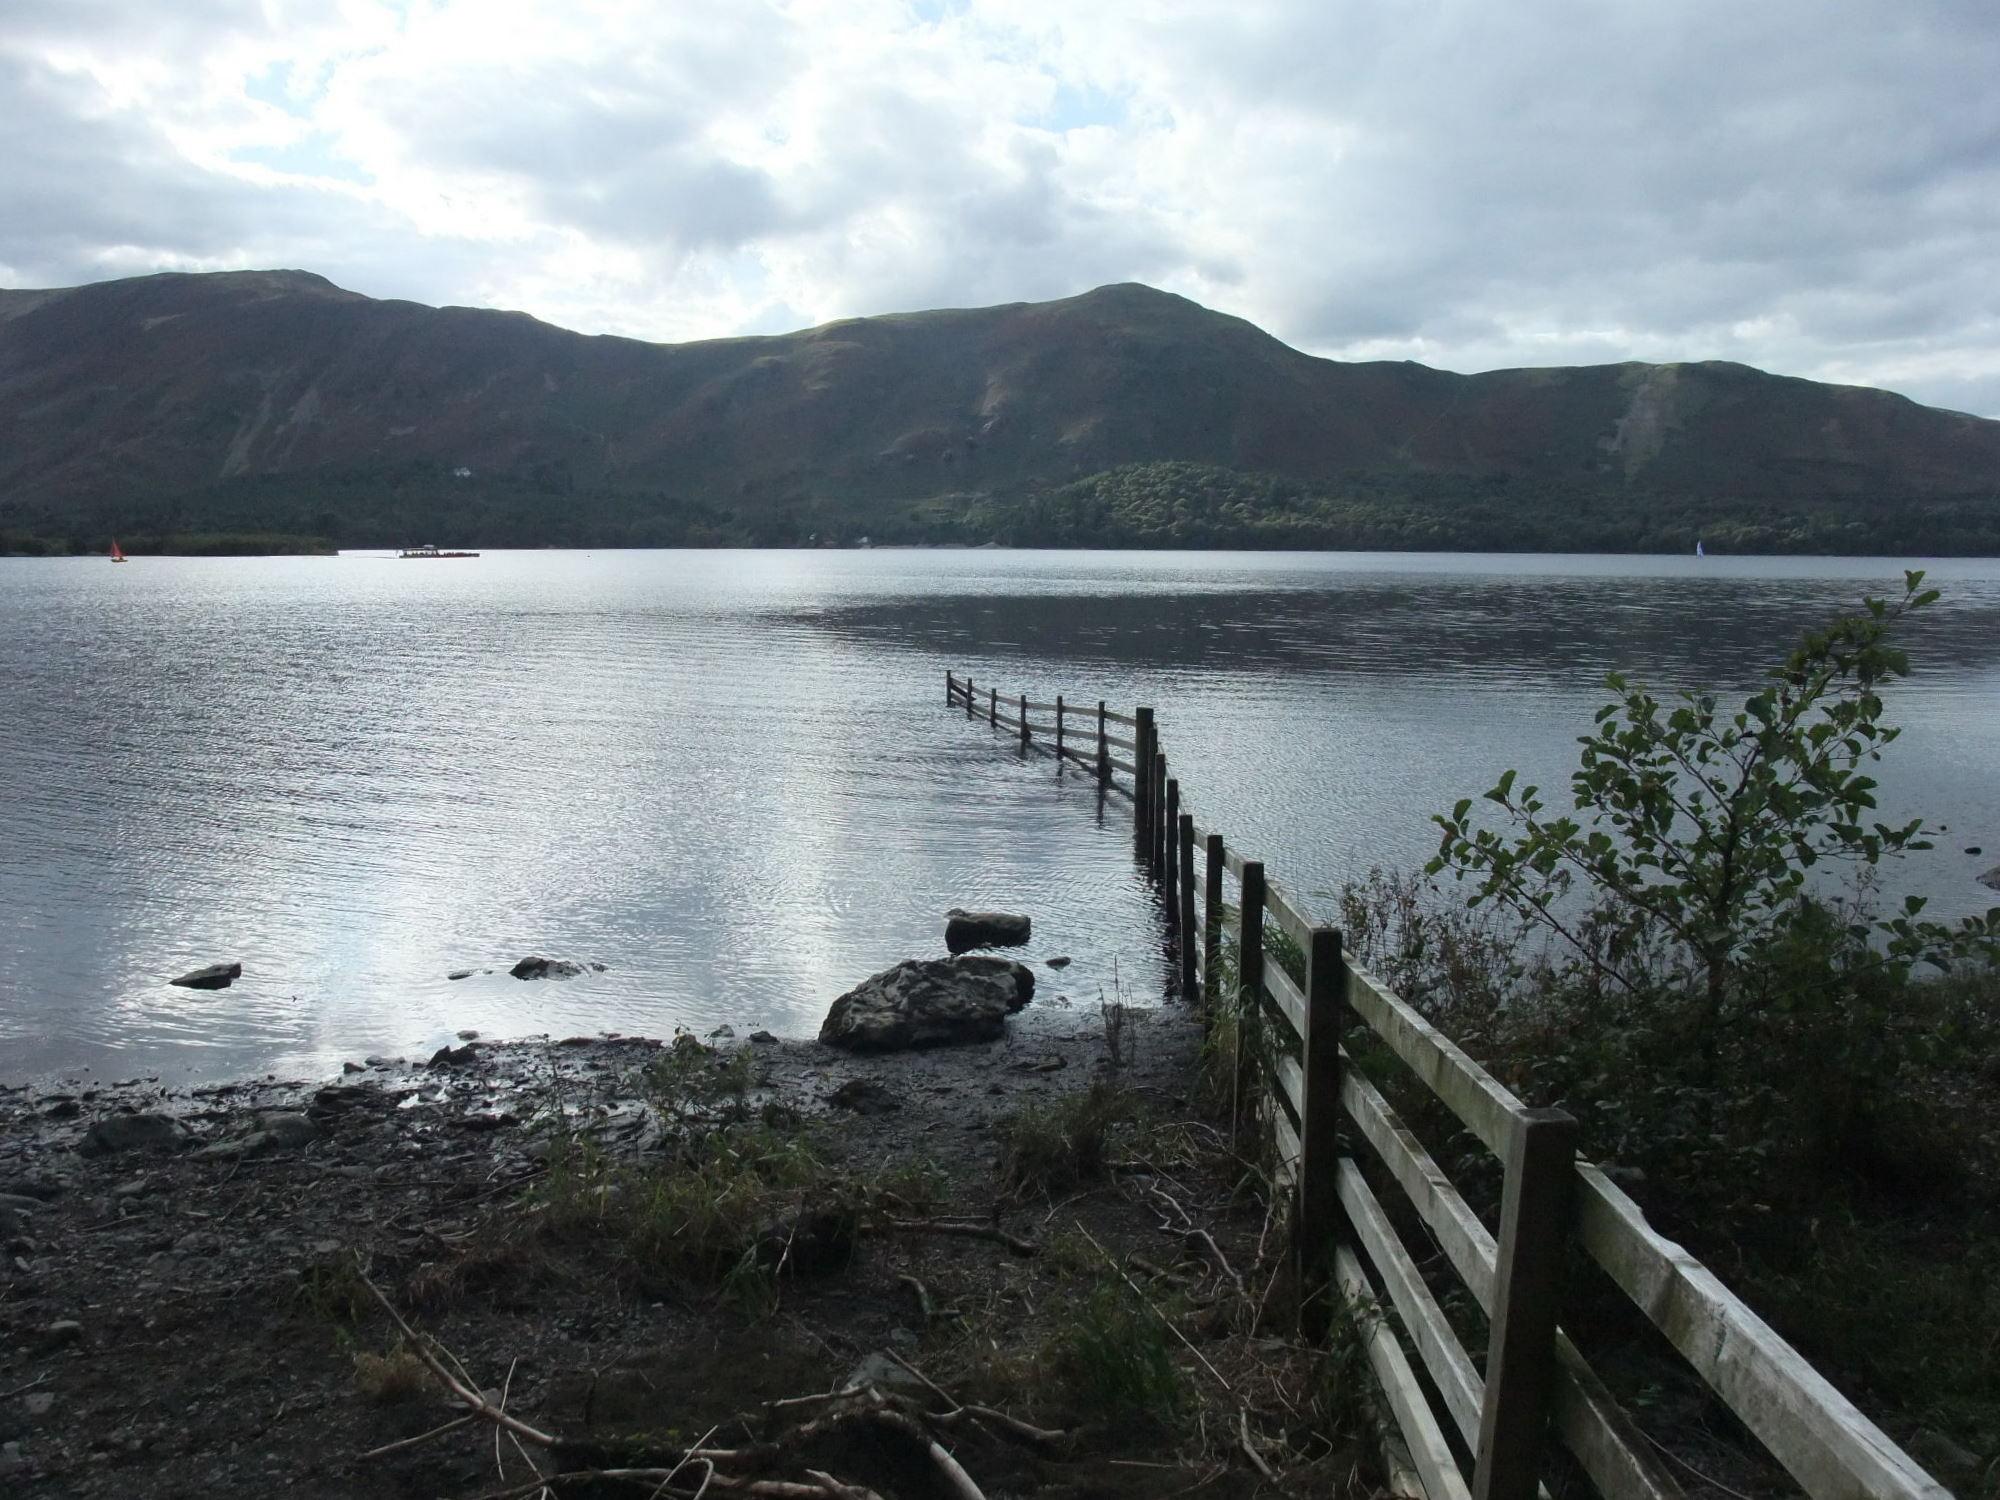 View across Derwent Water